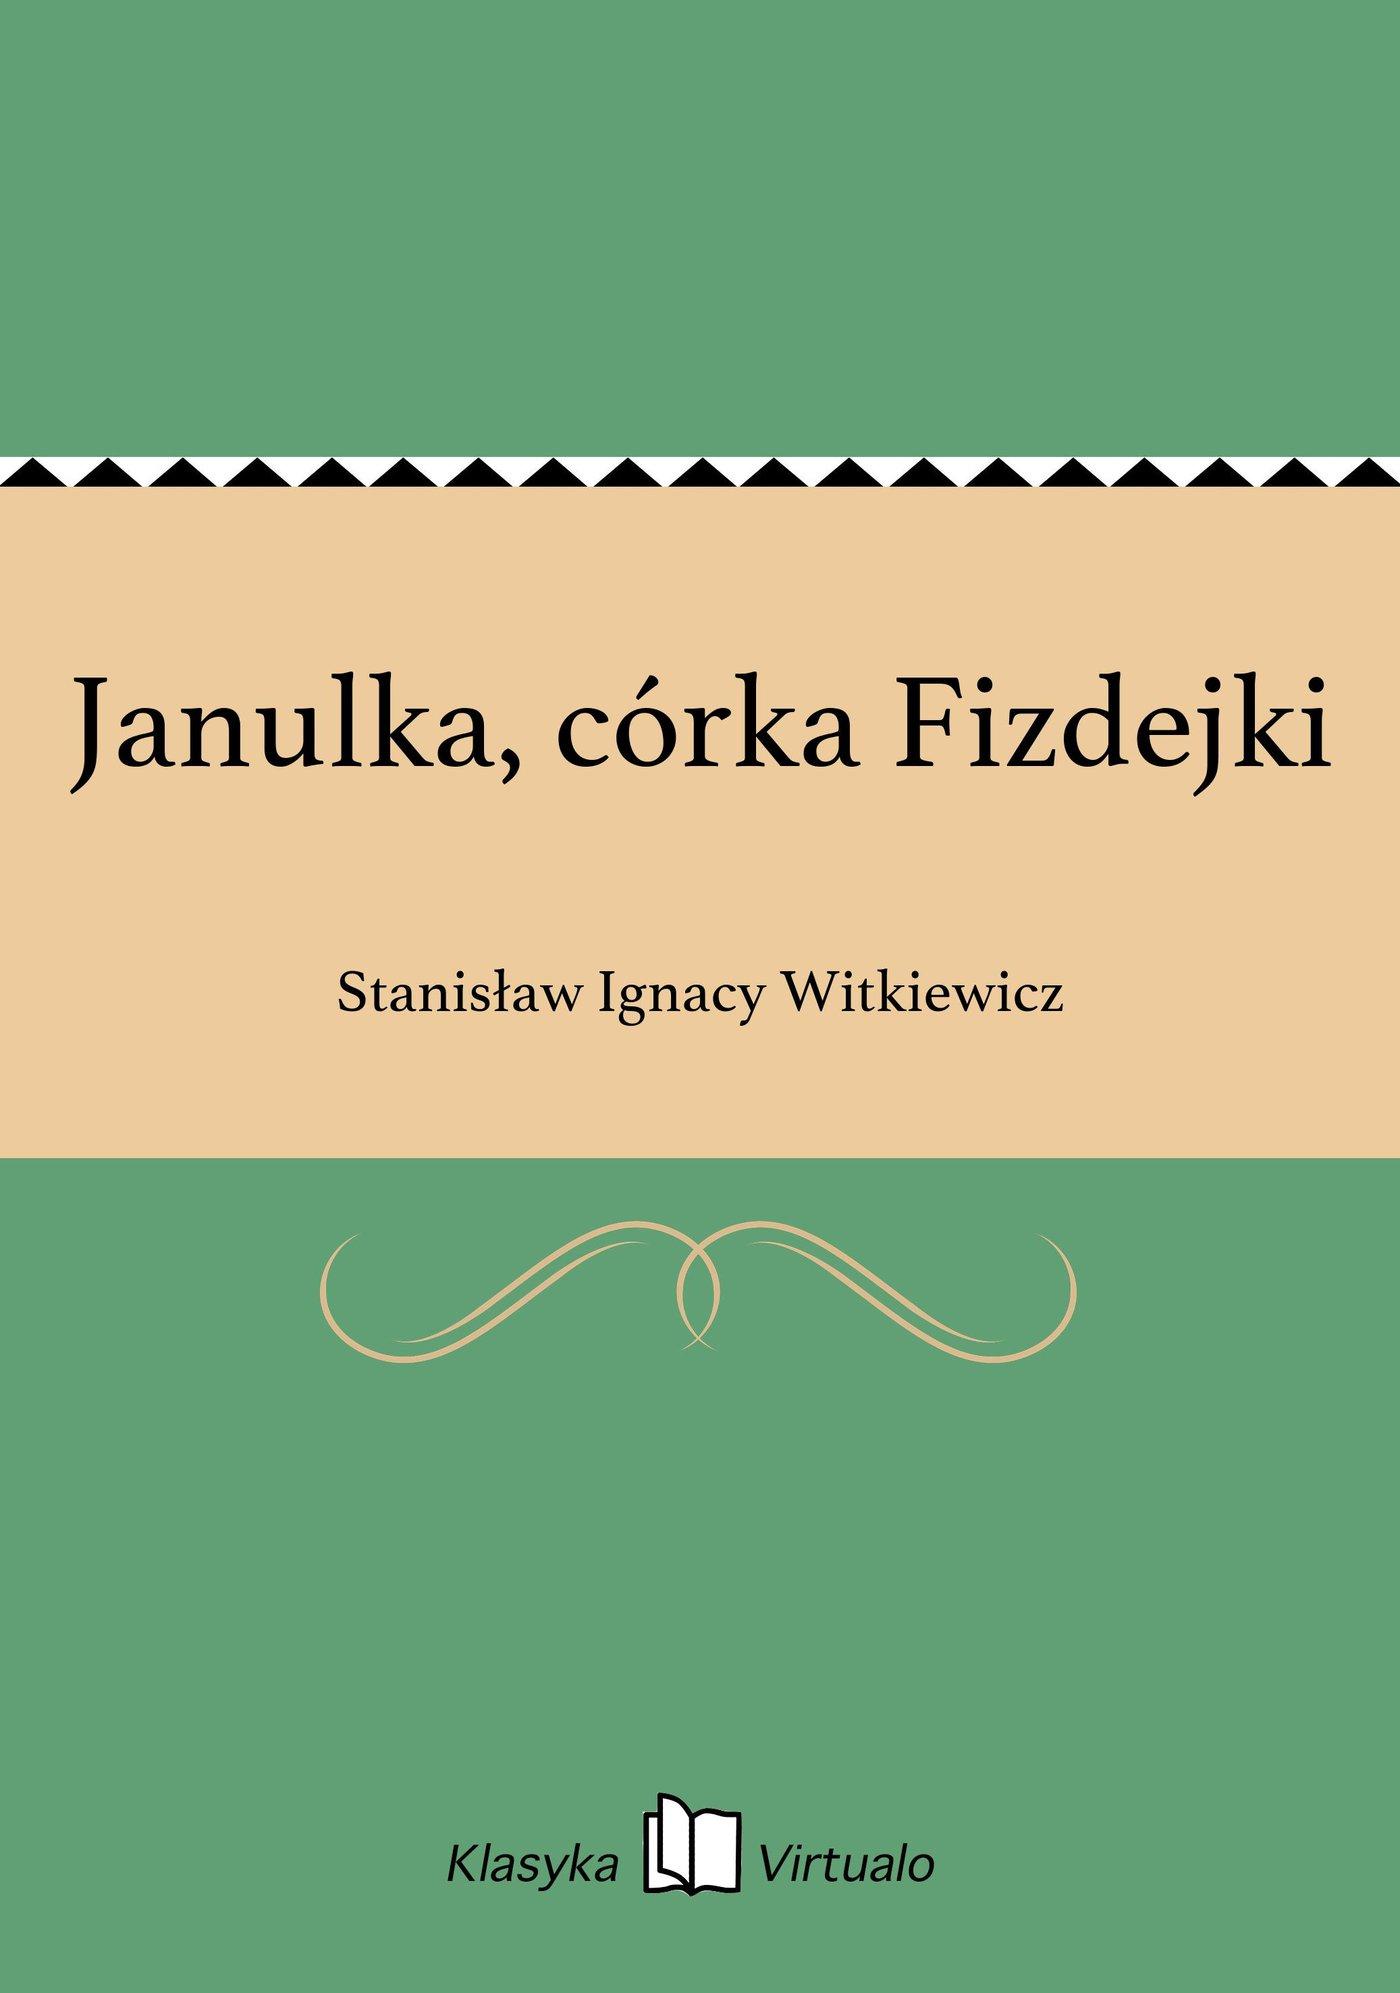 Janulka, córka Fizdejki - Ebook (Książka na Kindle) do pobrania w formacie MOBI